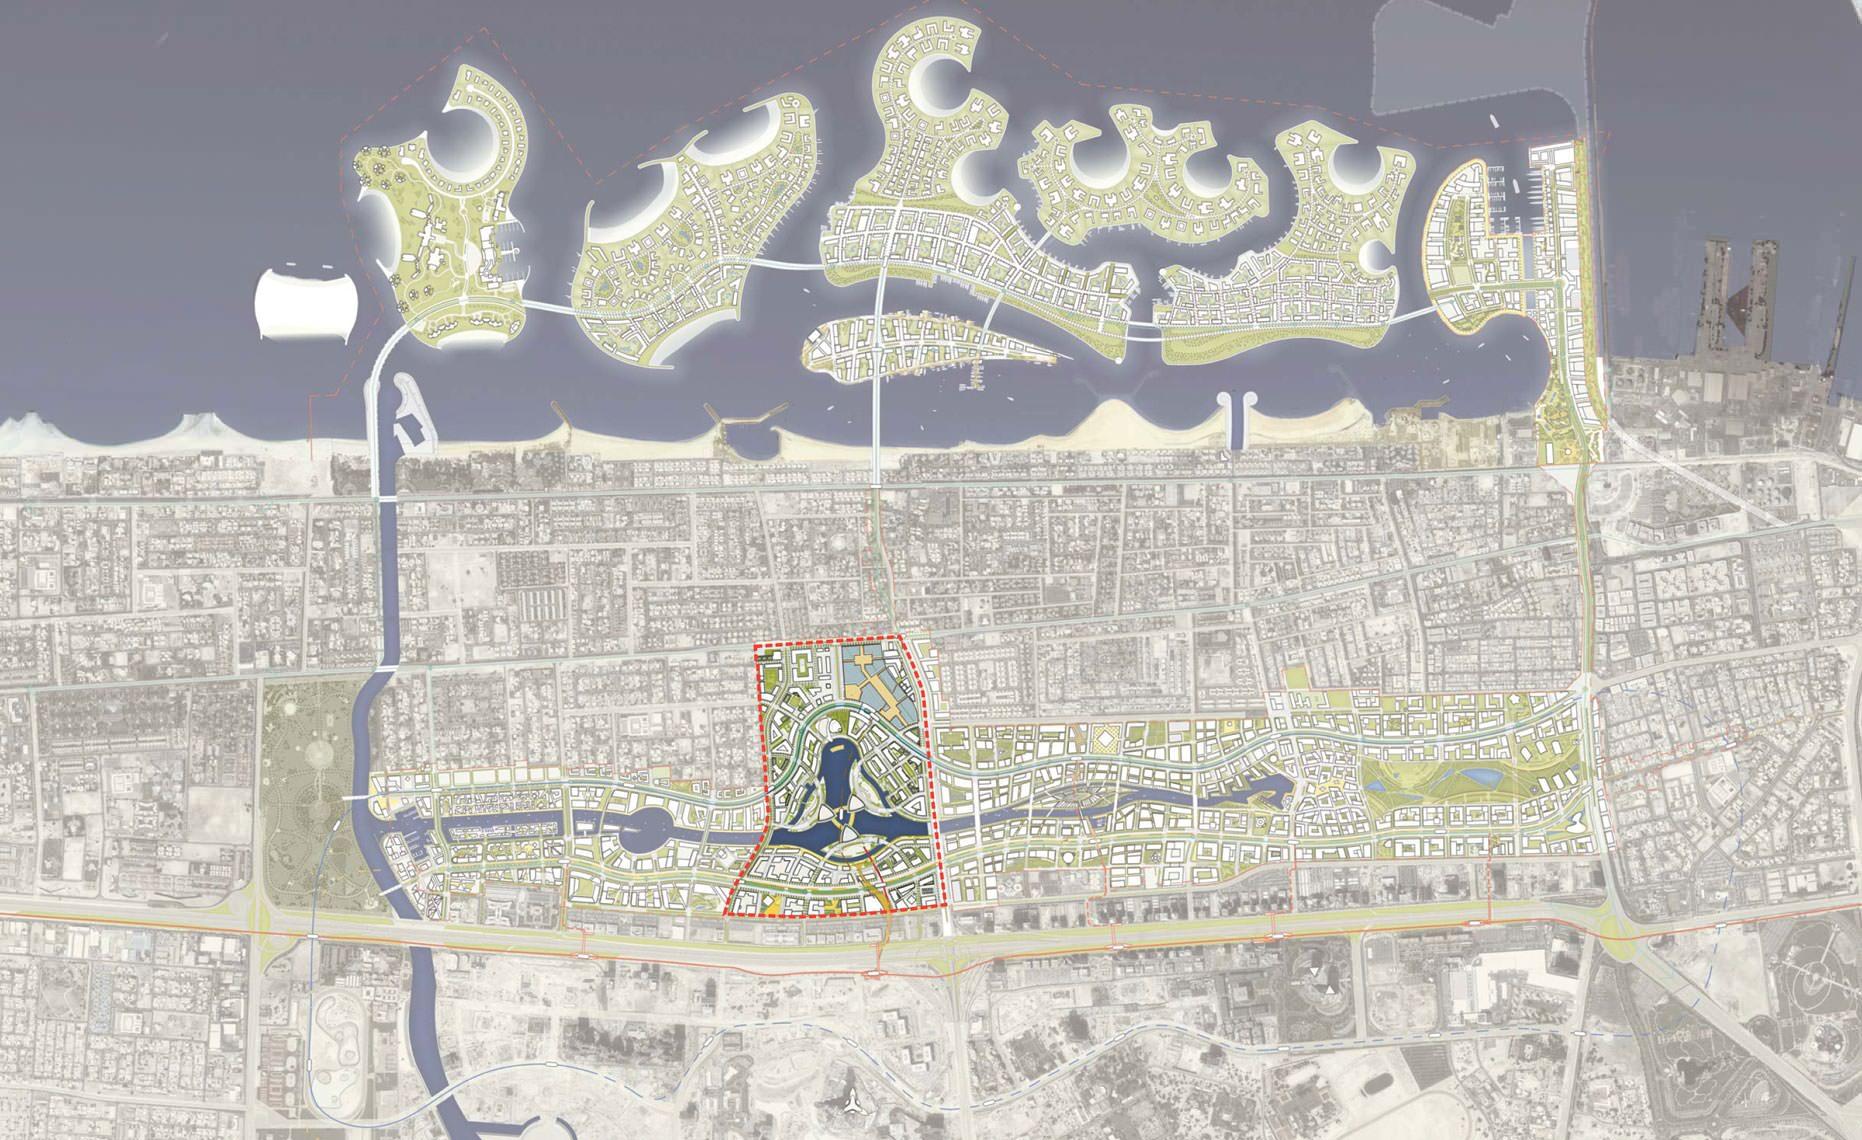 atriumcitymp_04forweb